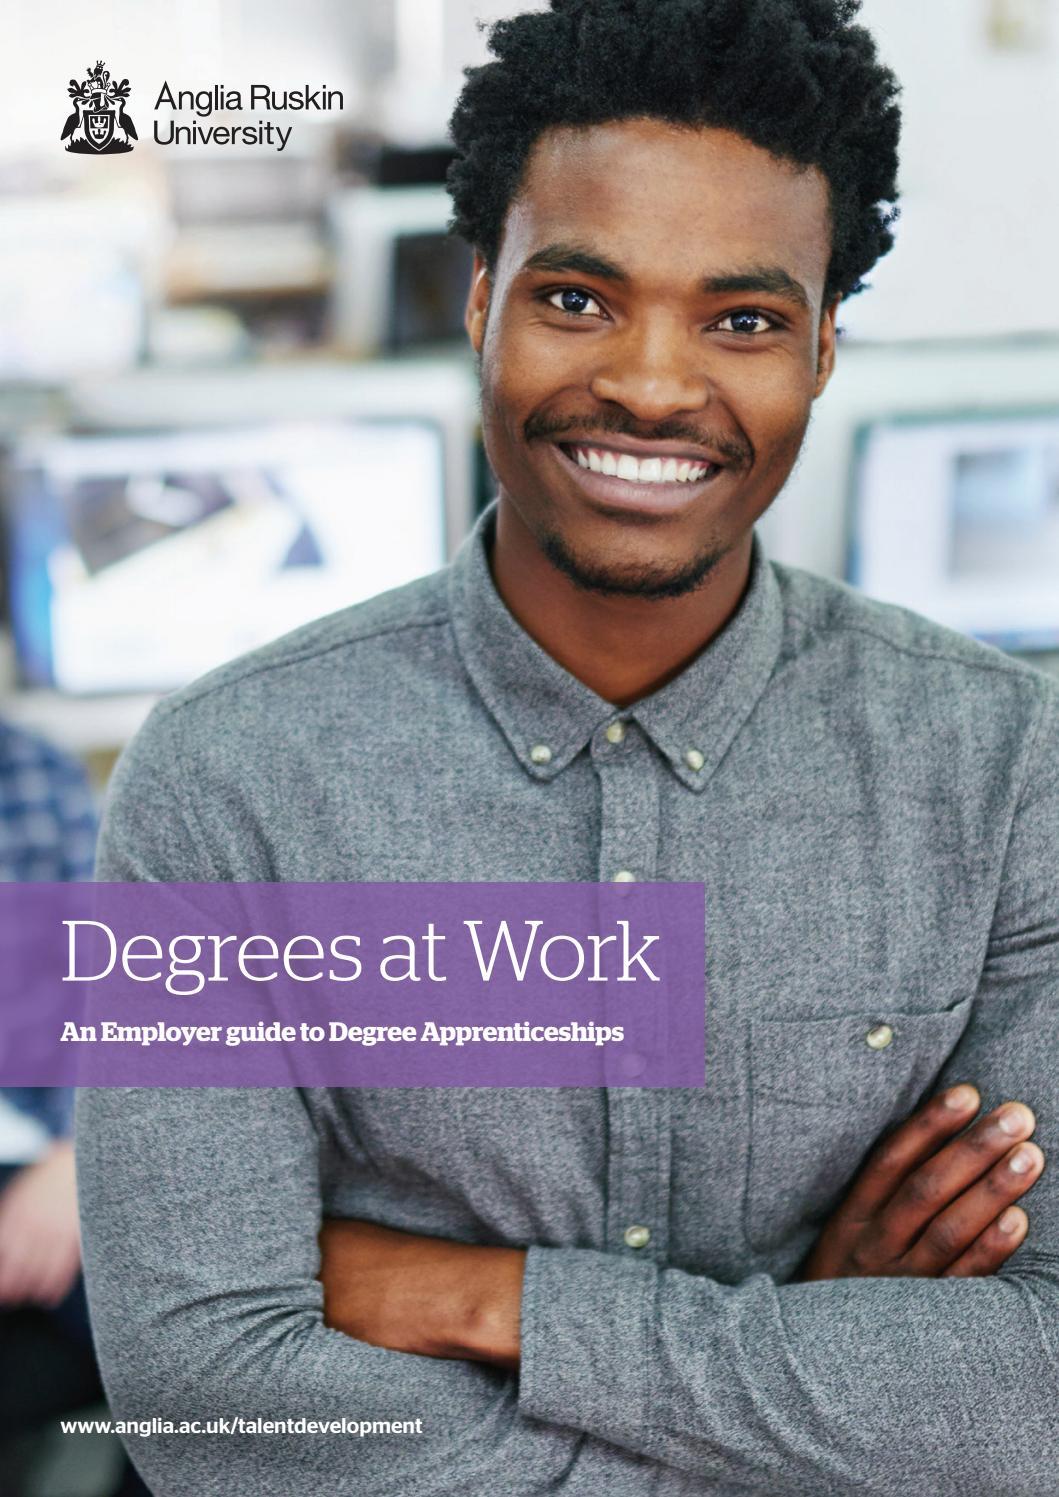 Aru Degrees At Work A4 Brochure 12pp By Georgia King Design Issuu